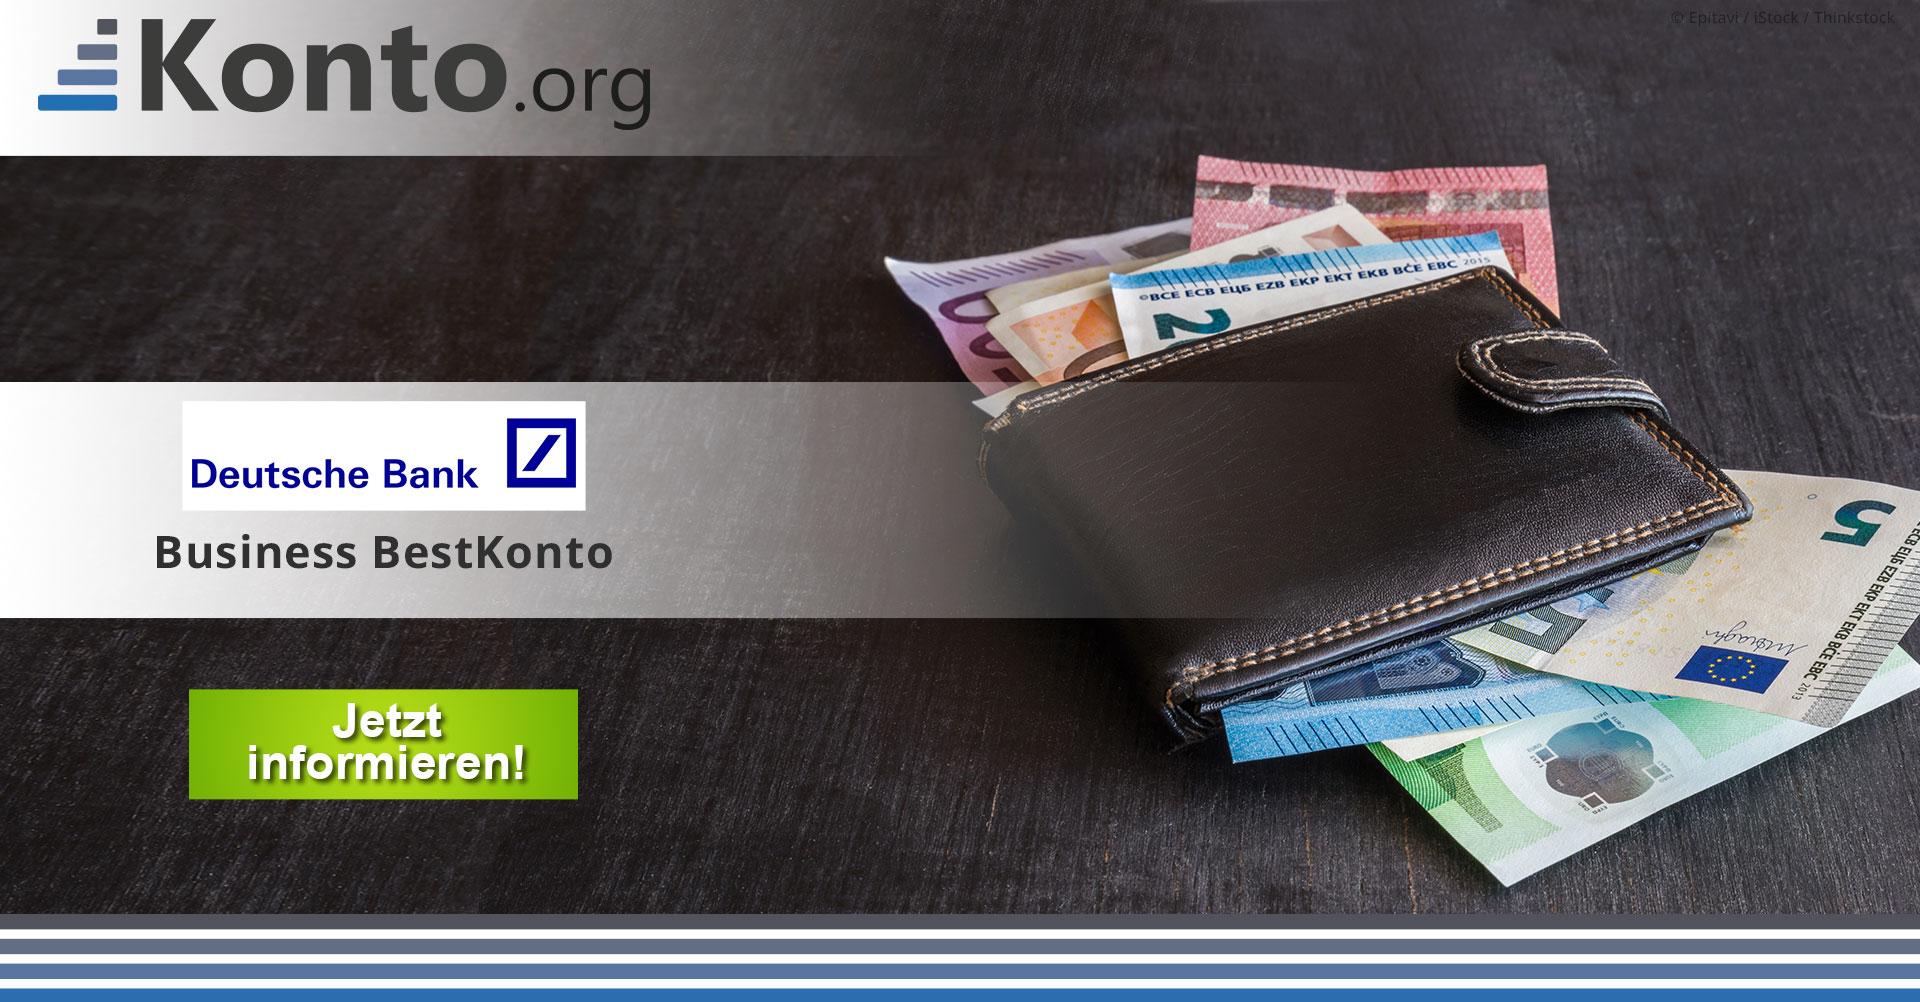 Deutsche Bank Ec Karte Sperren.Das Deutsche Bank Business Bestkonto Im Test